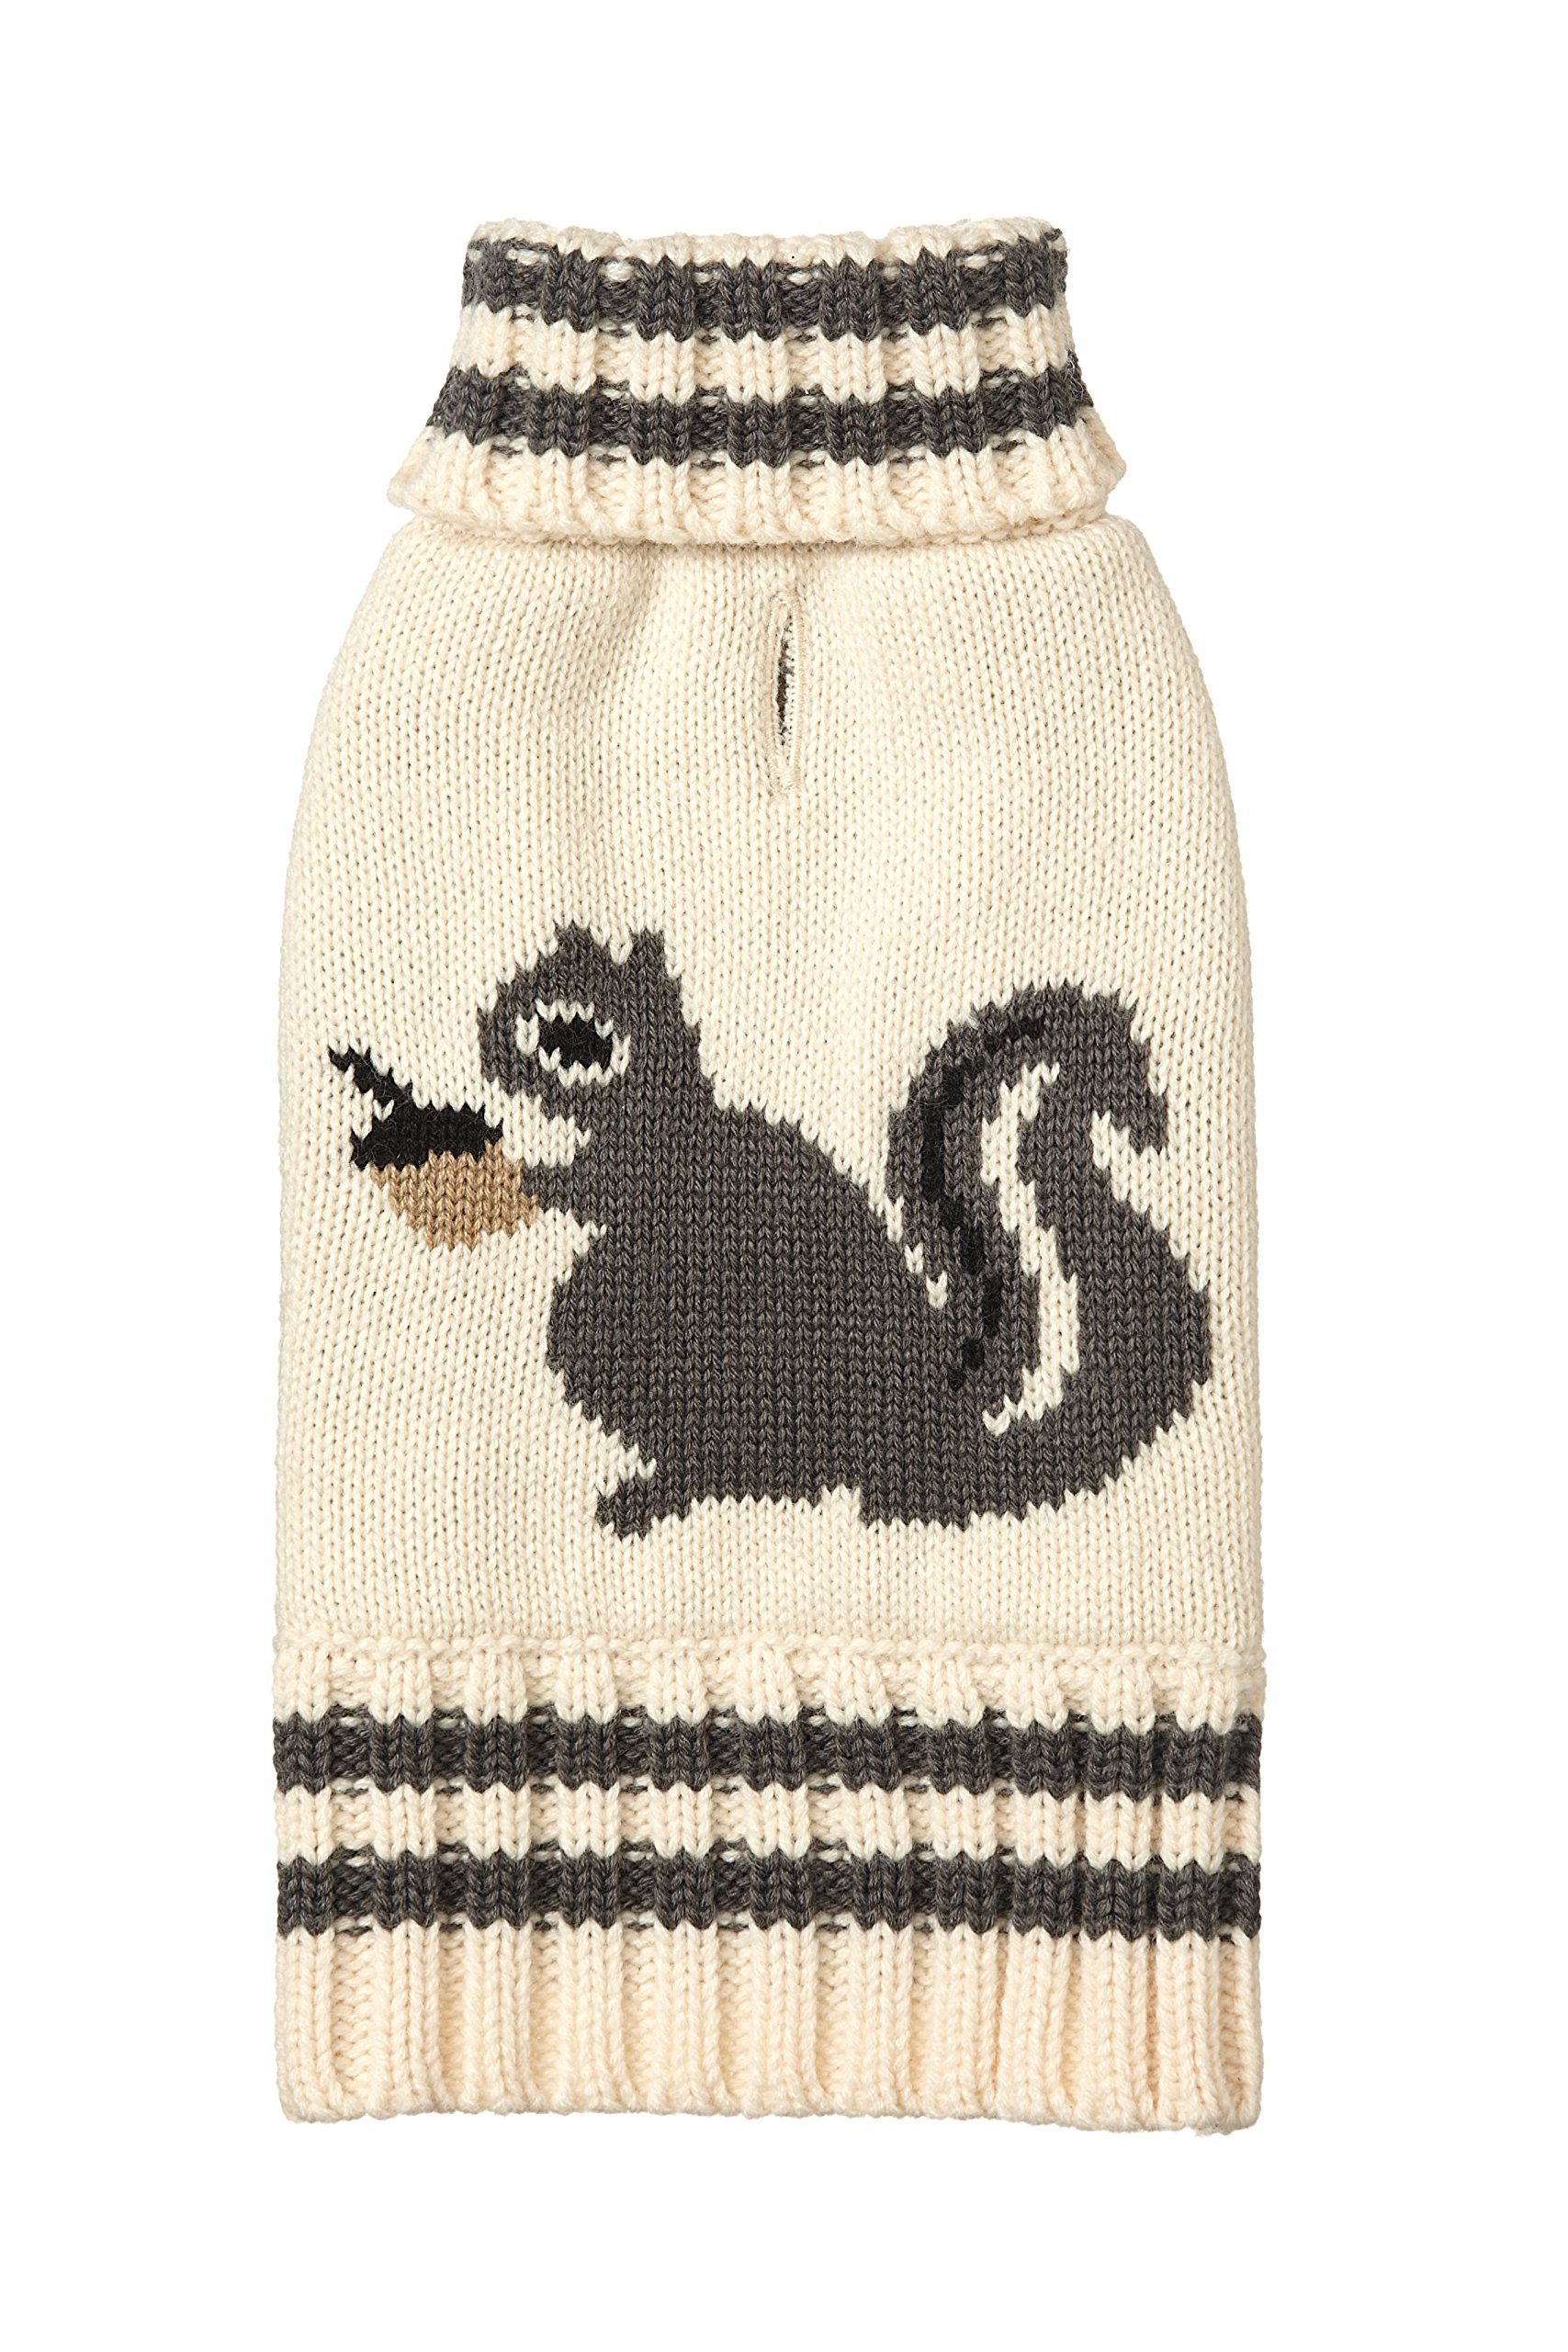 Fab Dog Americana Classics Knit Dog Sweater, Cream Squirrel, 16''